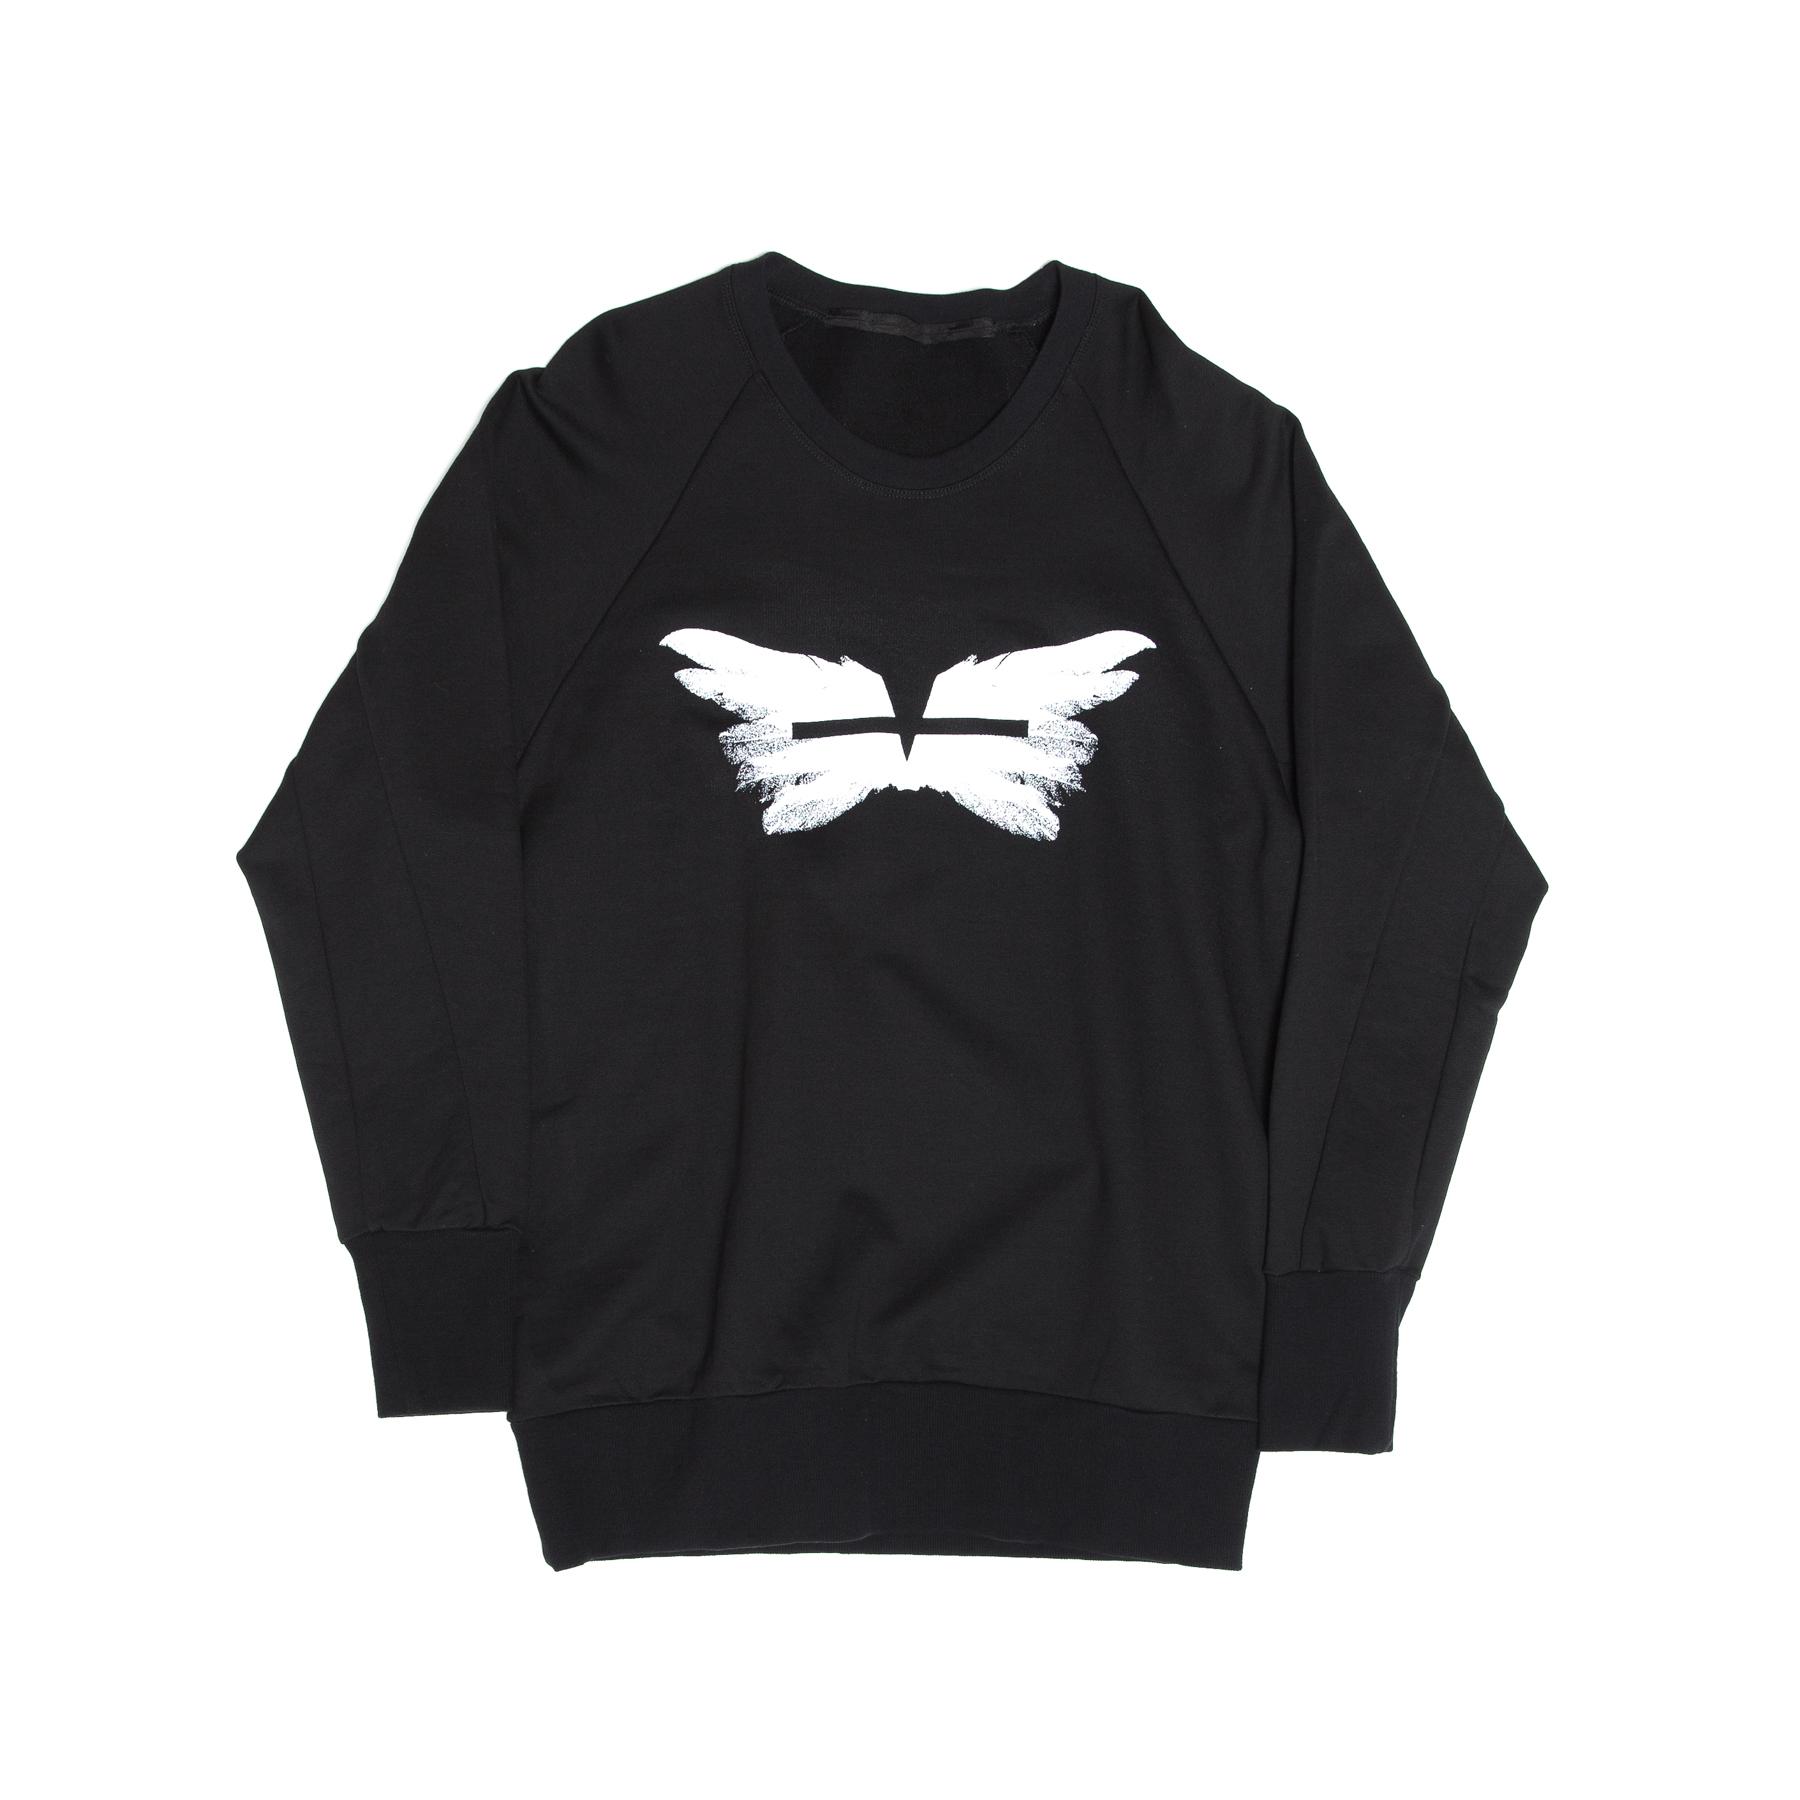 617CPM1-BLACK / ウィングスウェットシャツ